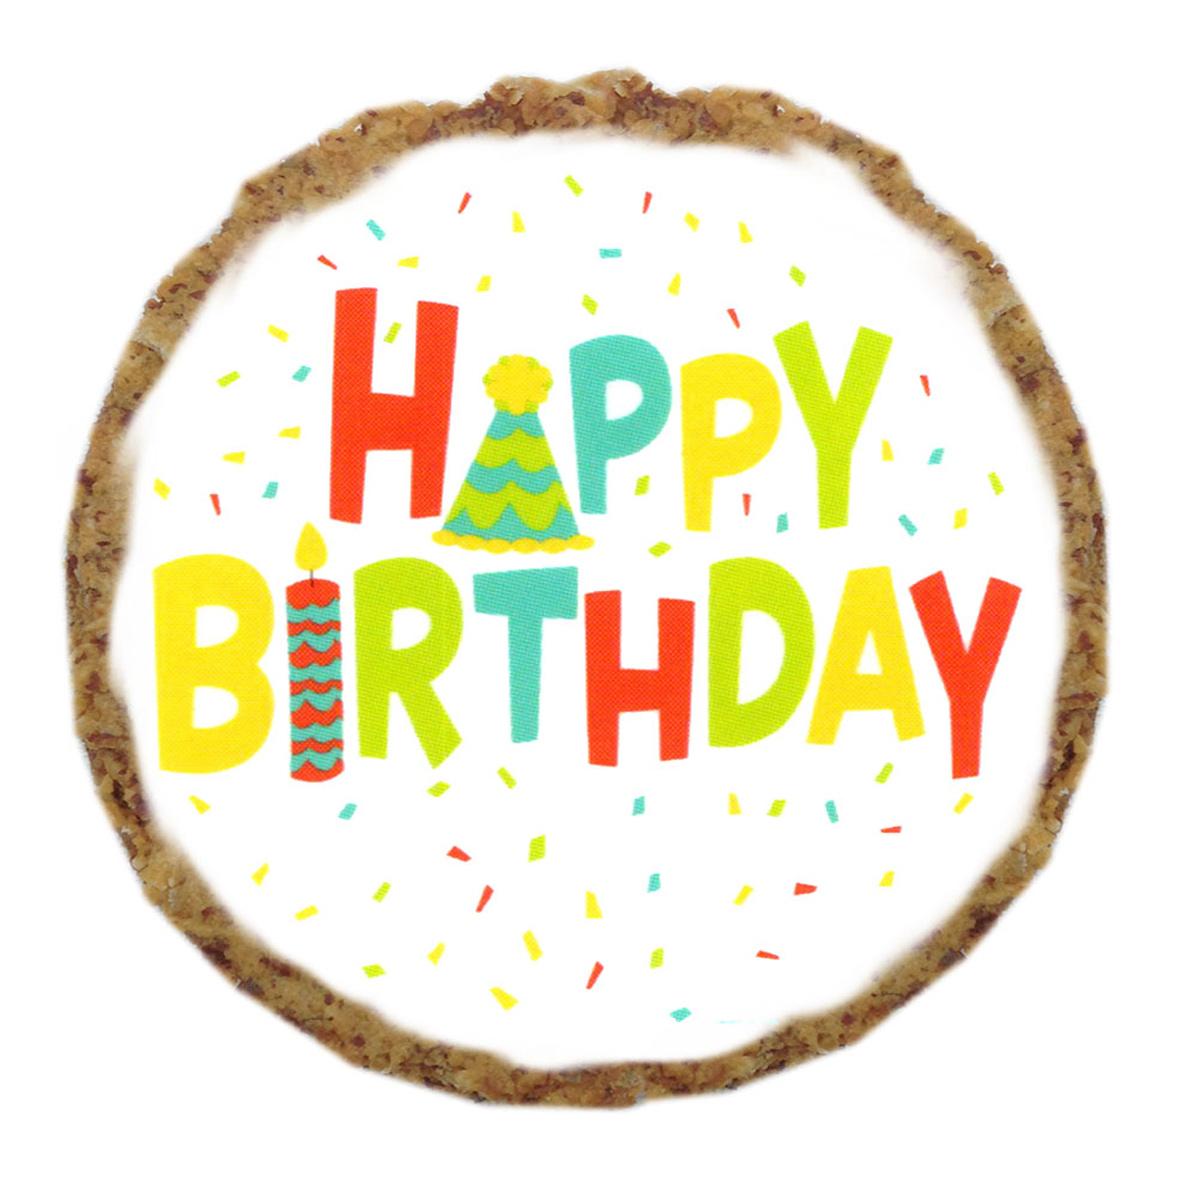 Happy Birthday Dog Treat Cookie - White